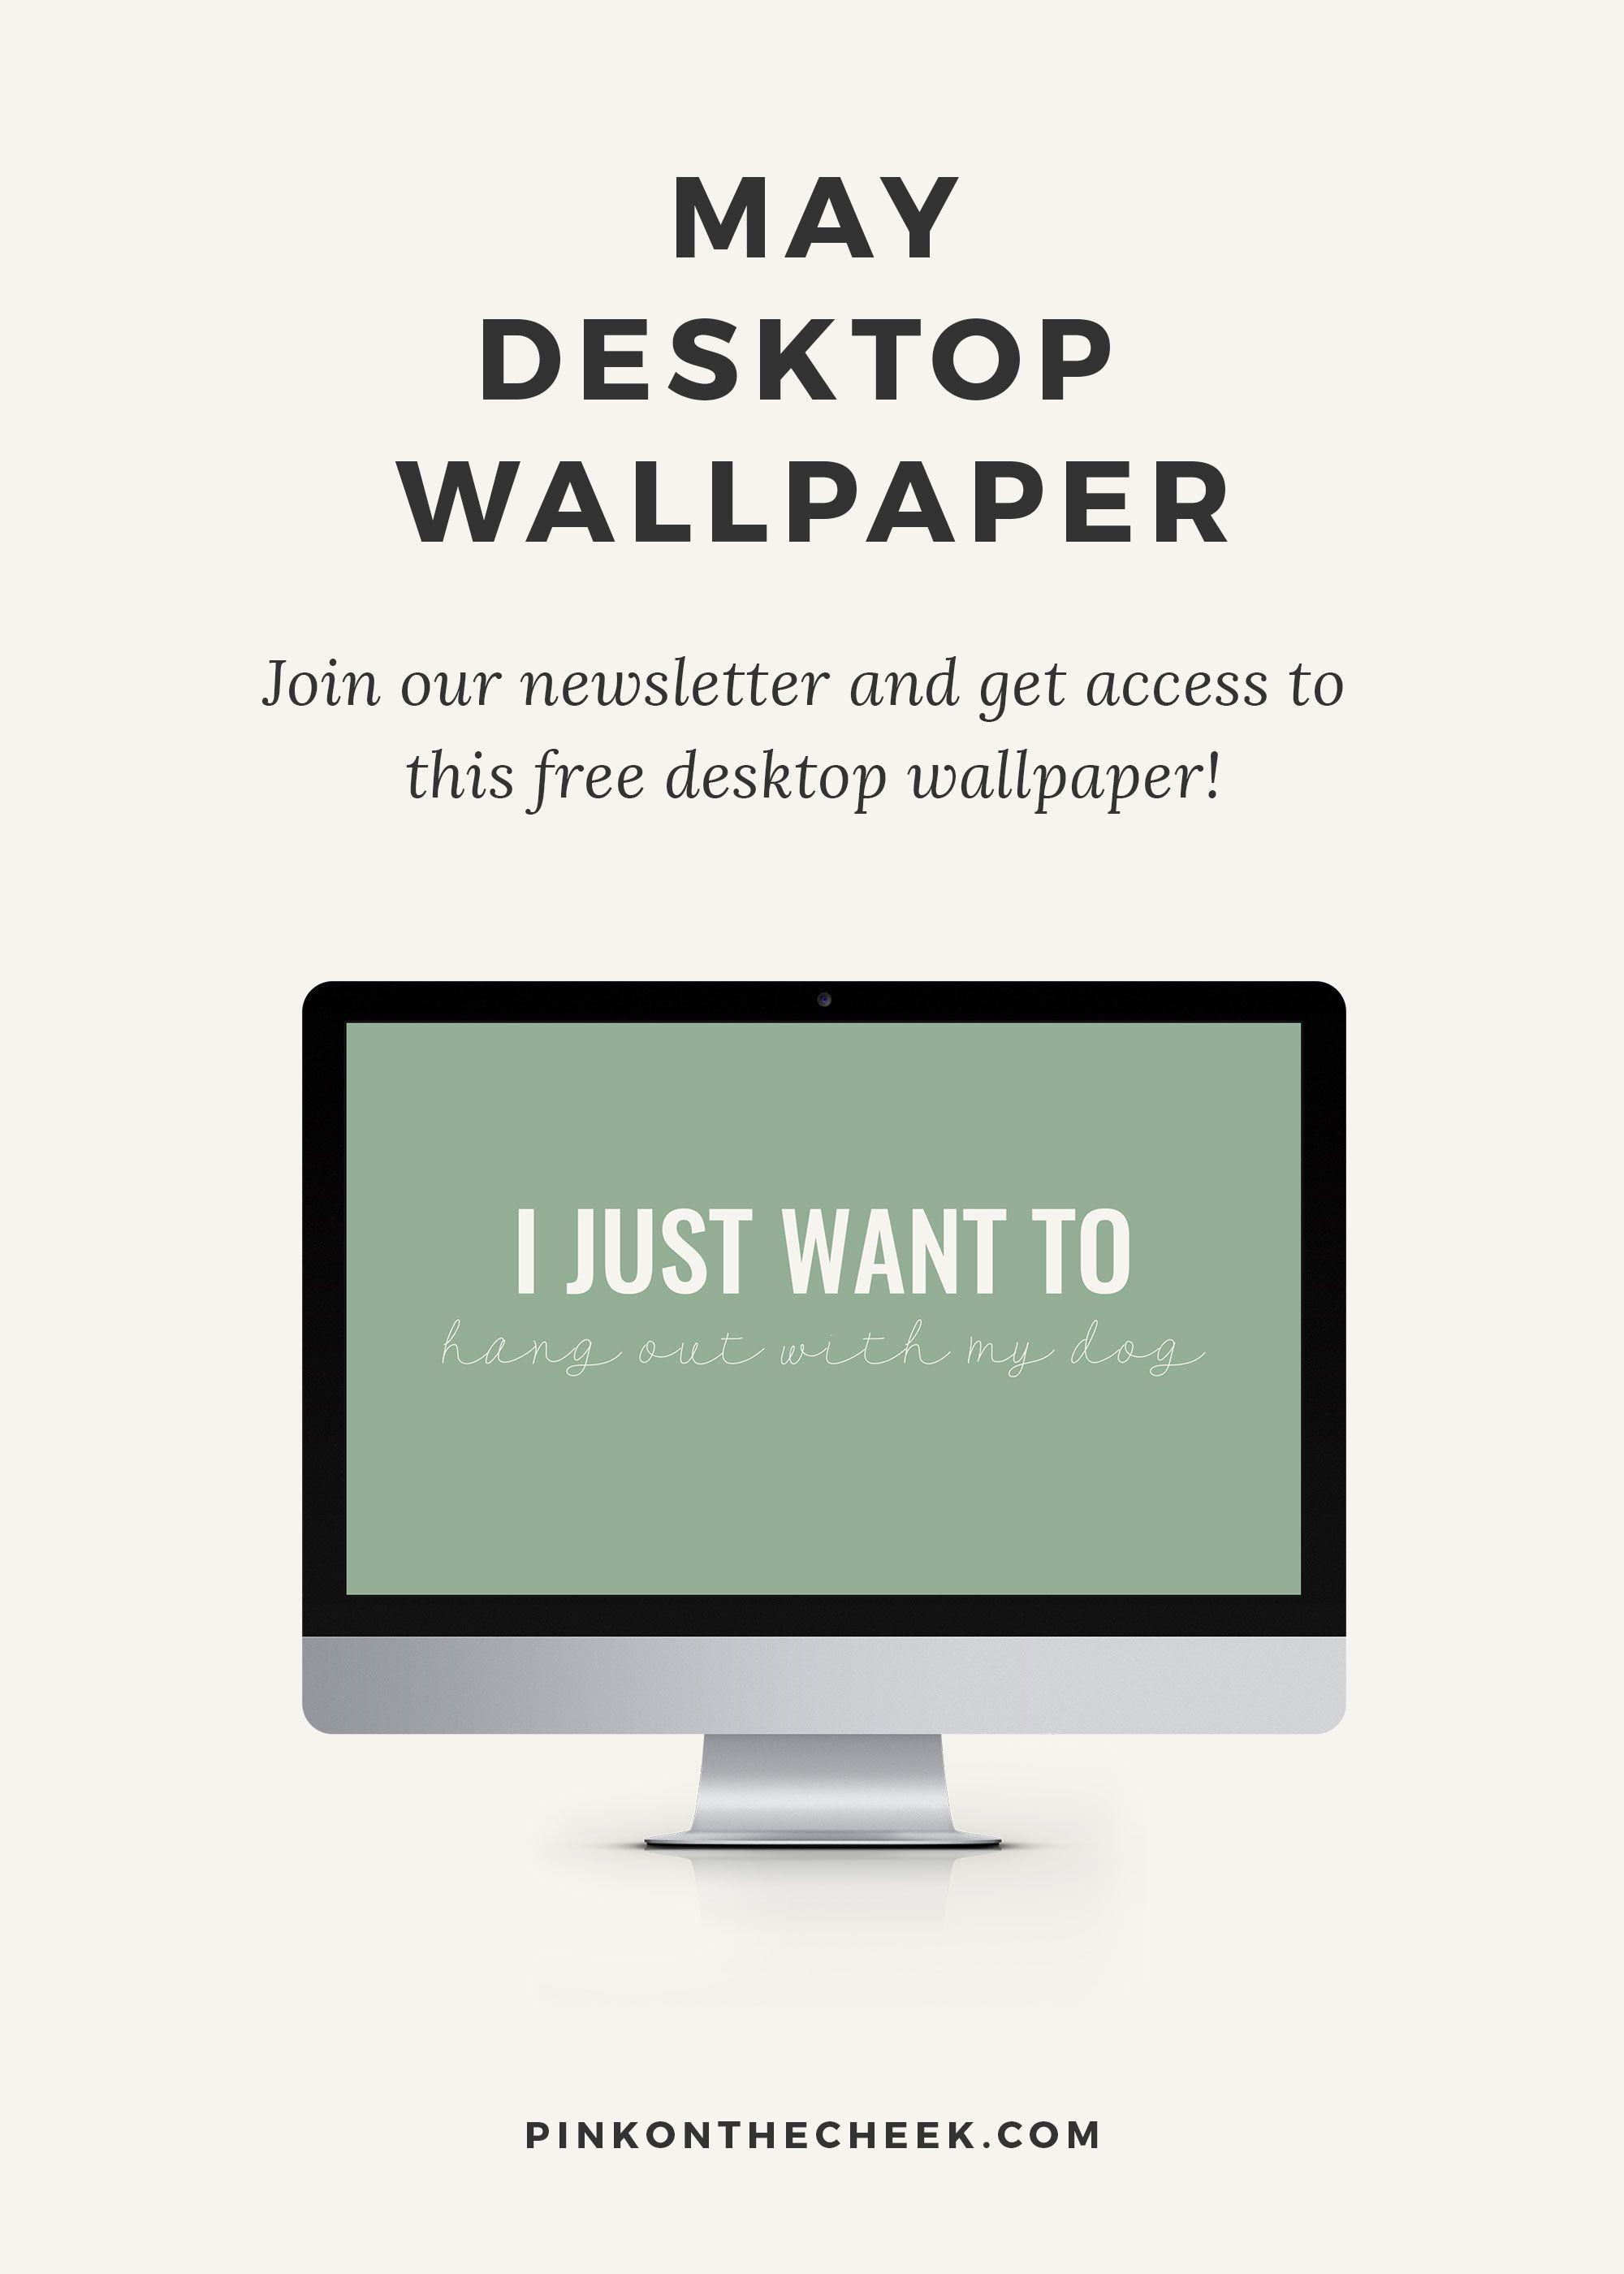 May Desktop Wallpaper Freebie